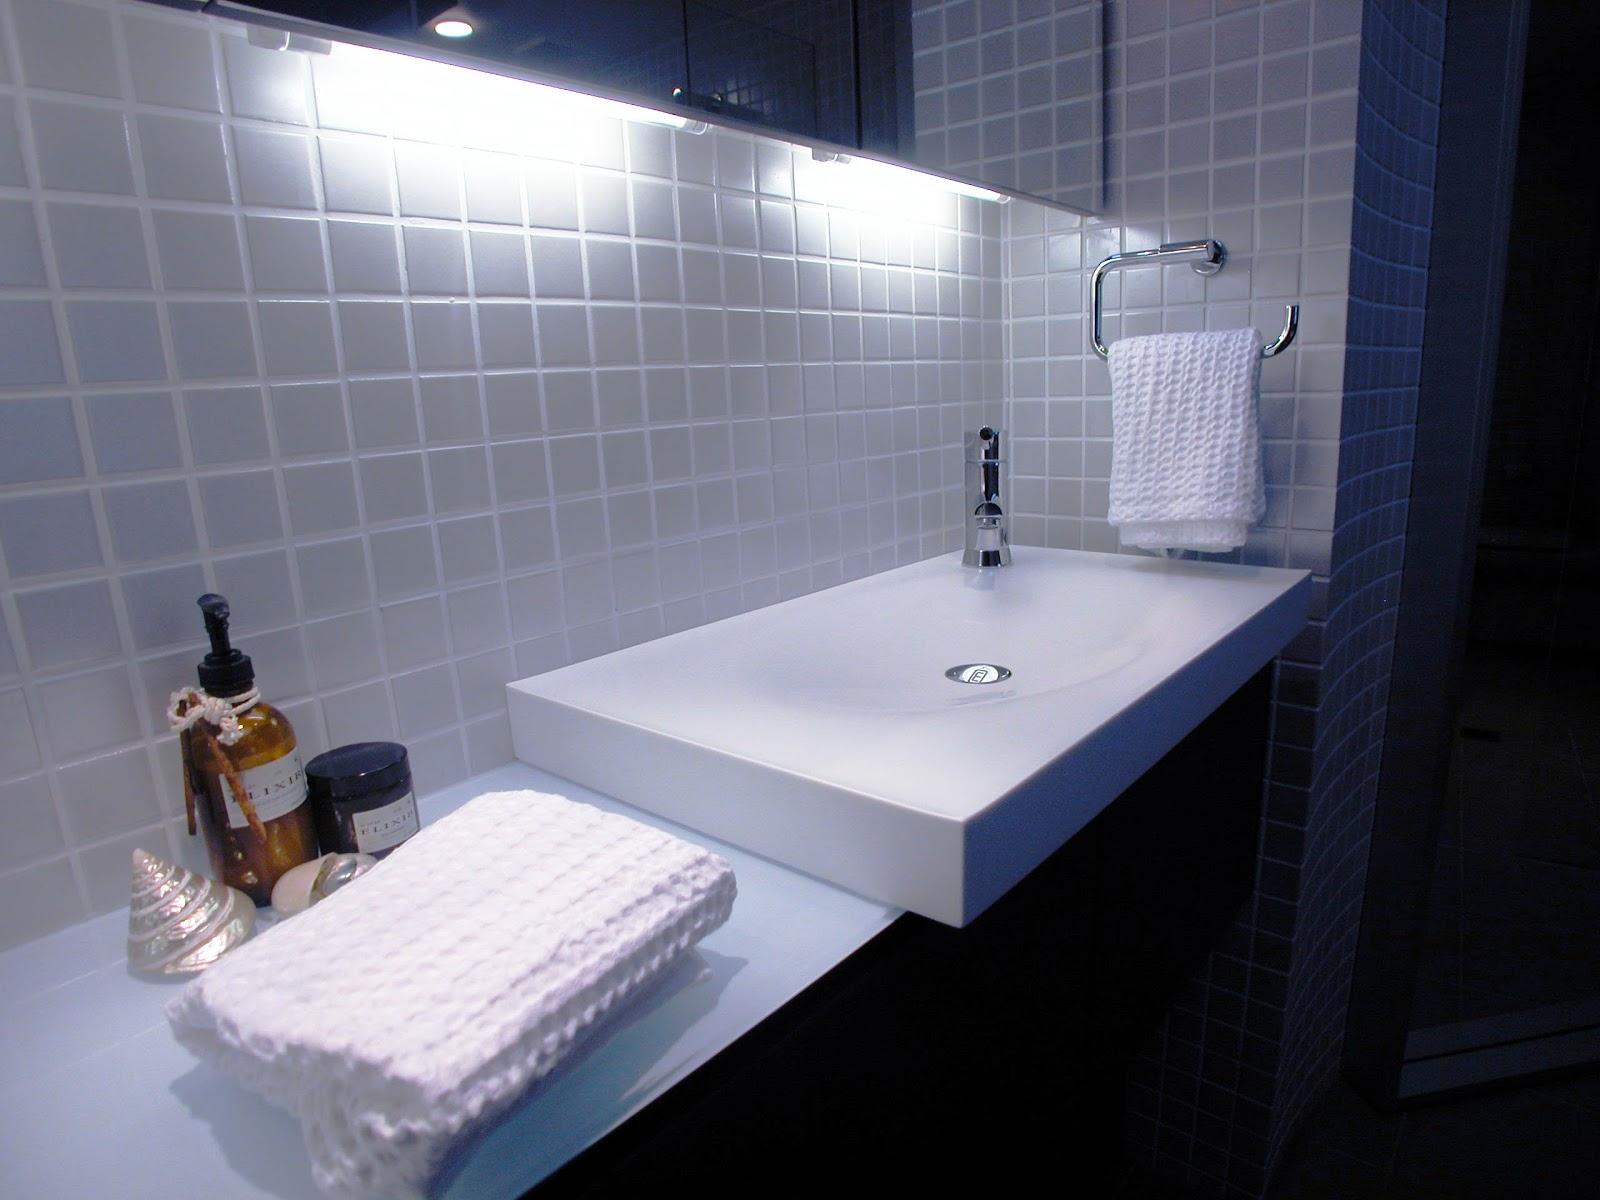 Minosa new minosa bathroom design resort style ensuite - Modern Main Bathroom Designed To Share